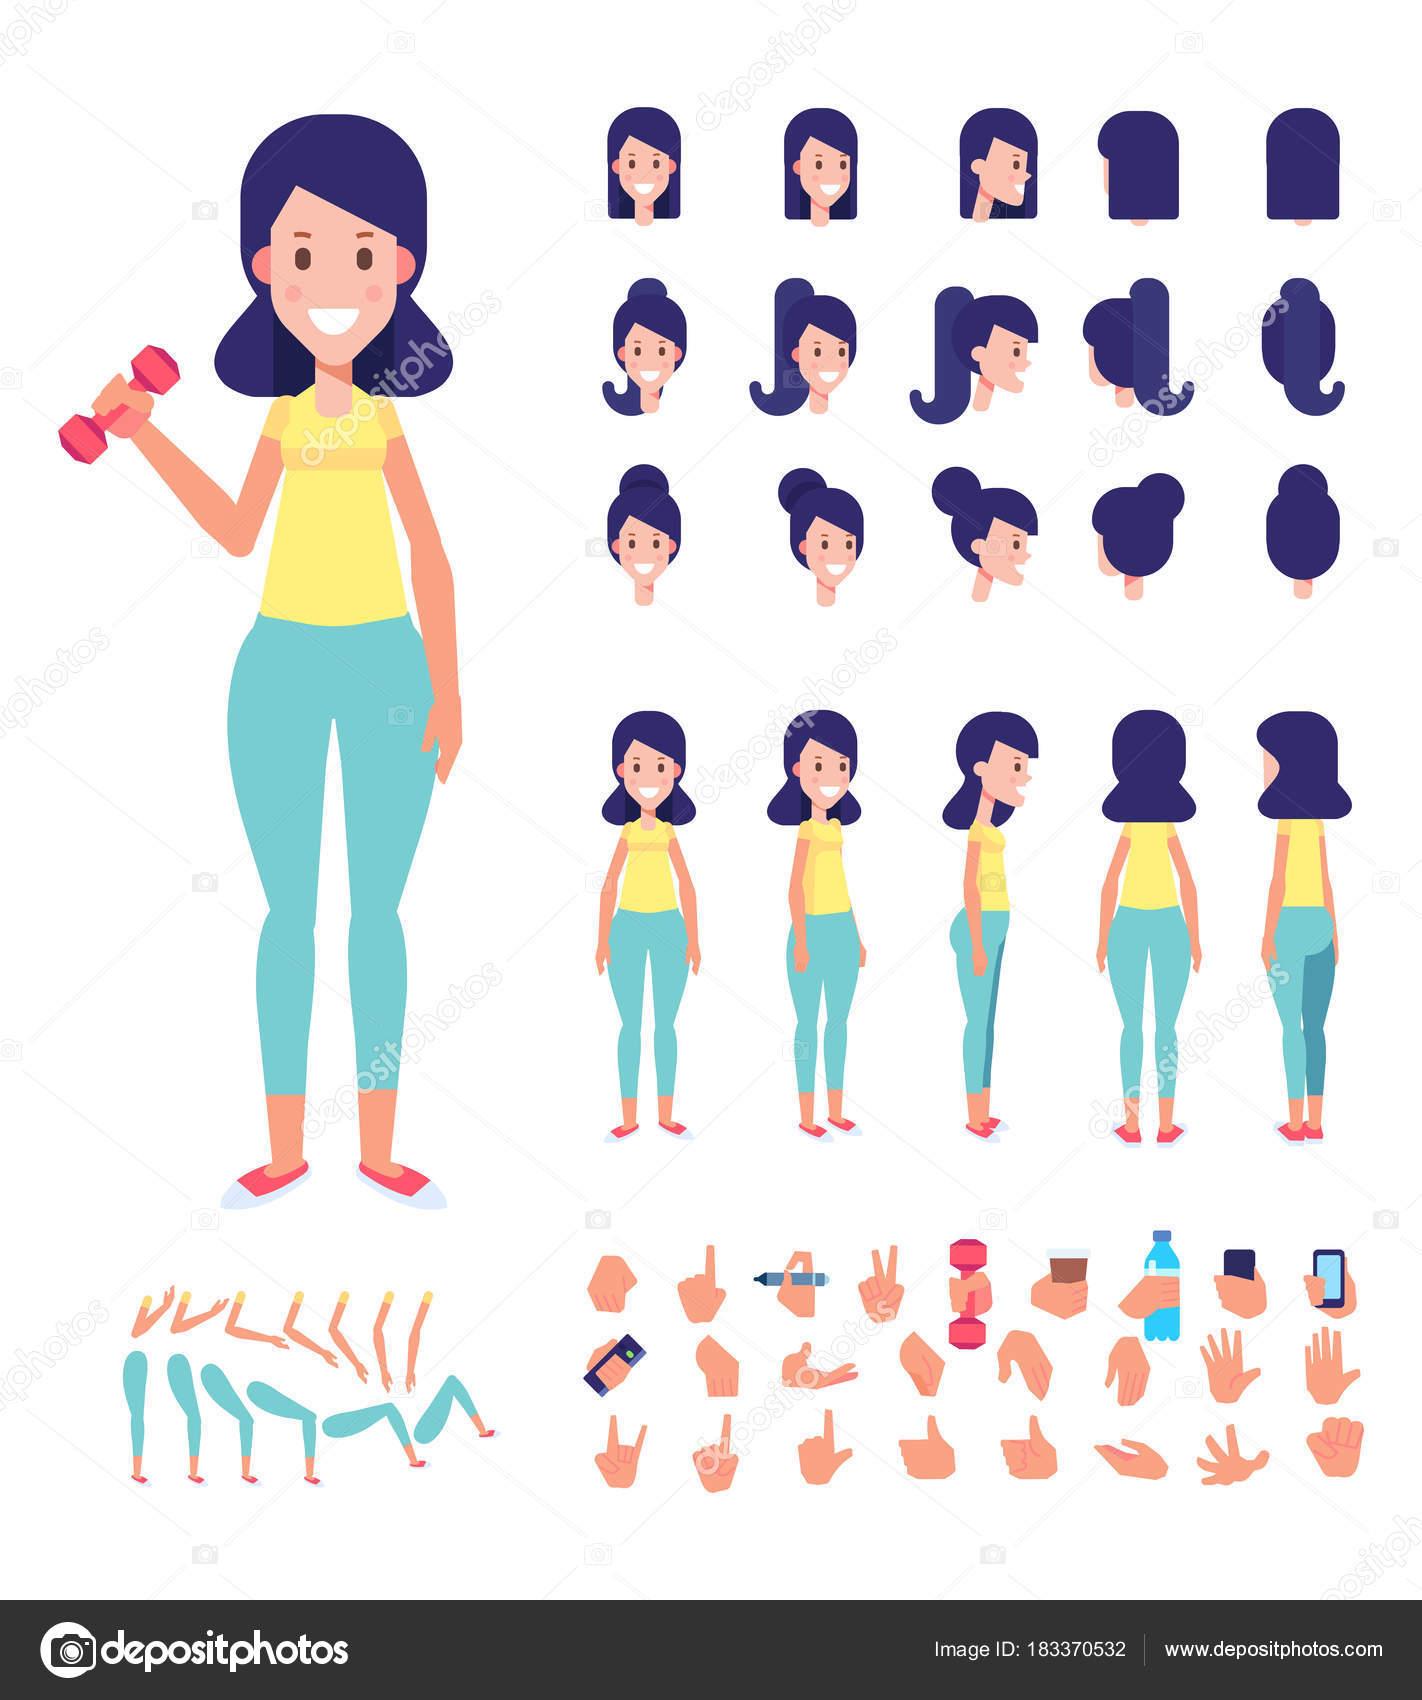 Характер девушки по форме причесок